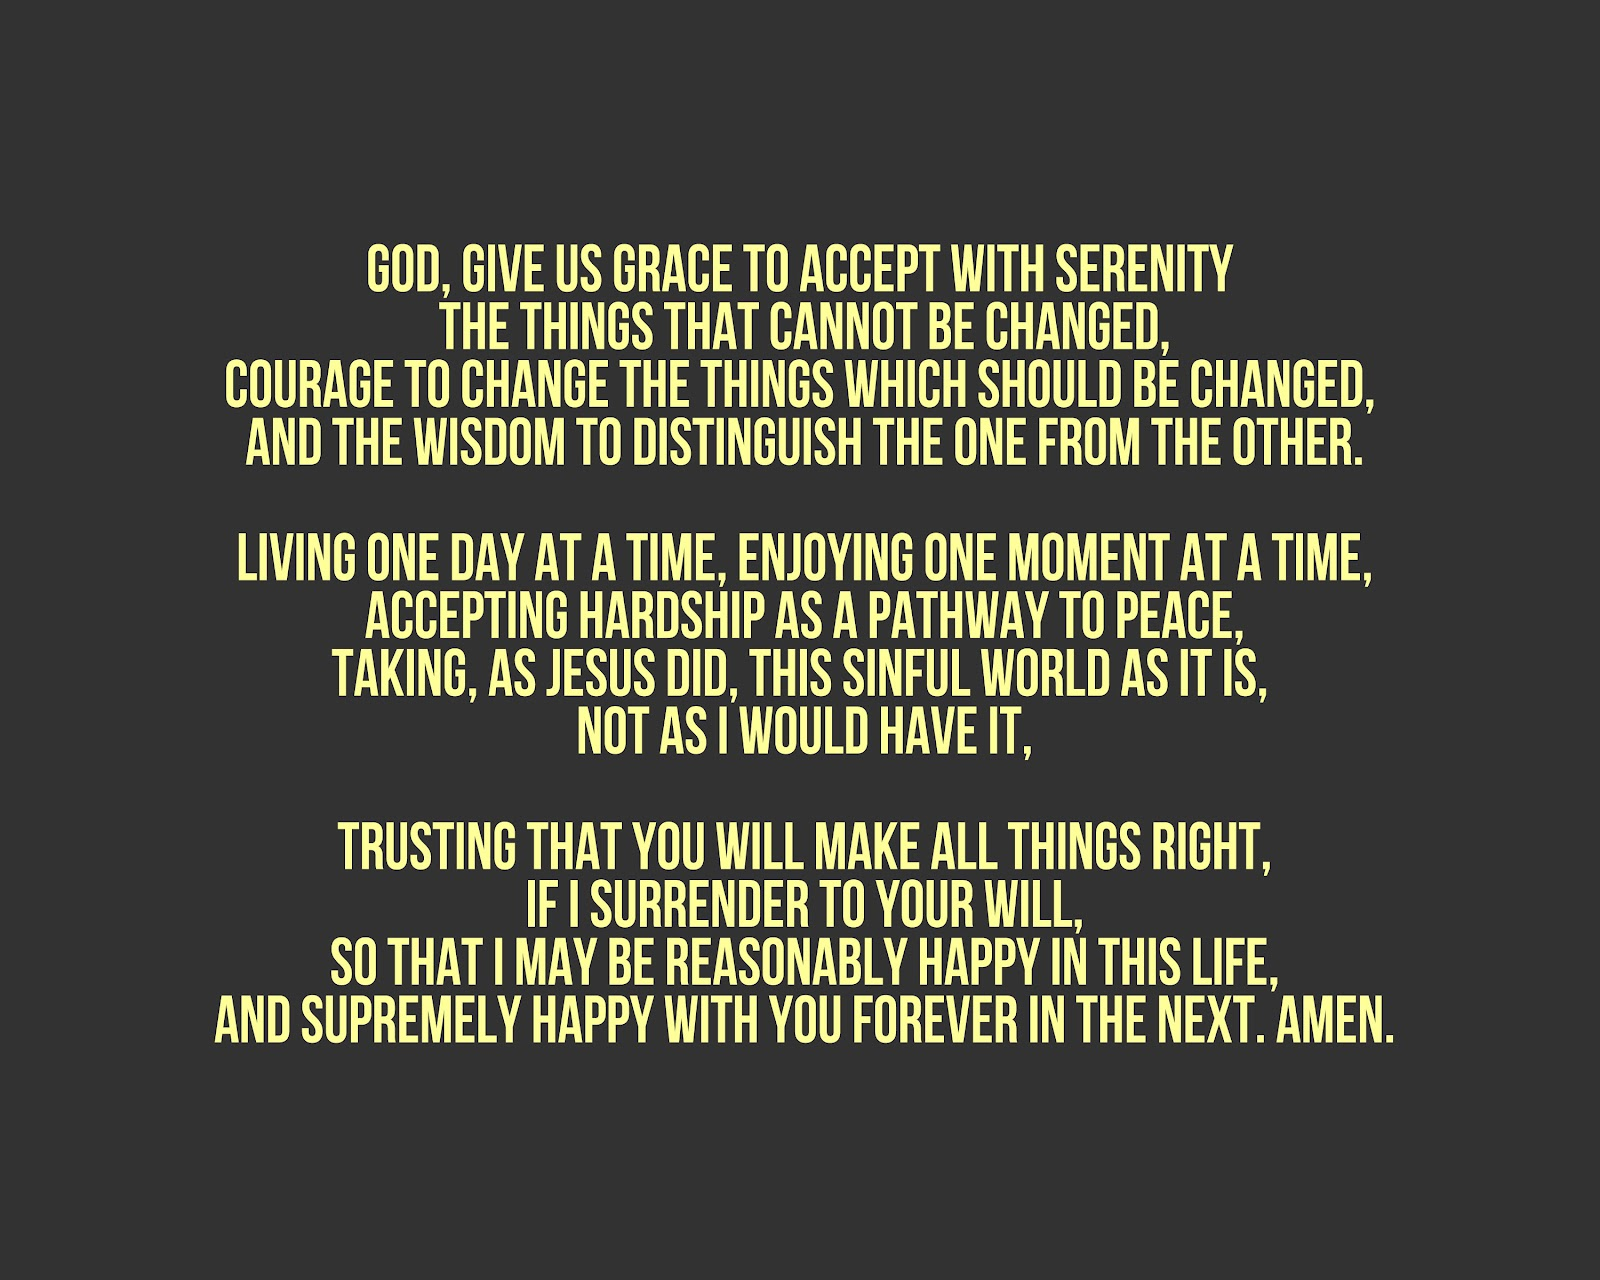 Serenity Prayer Phone Wallpaper Uzueta Pictures 1600x1280